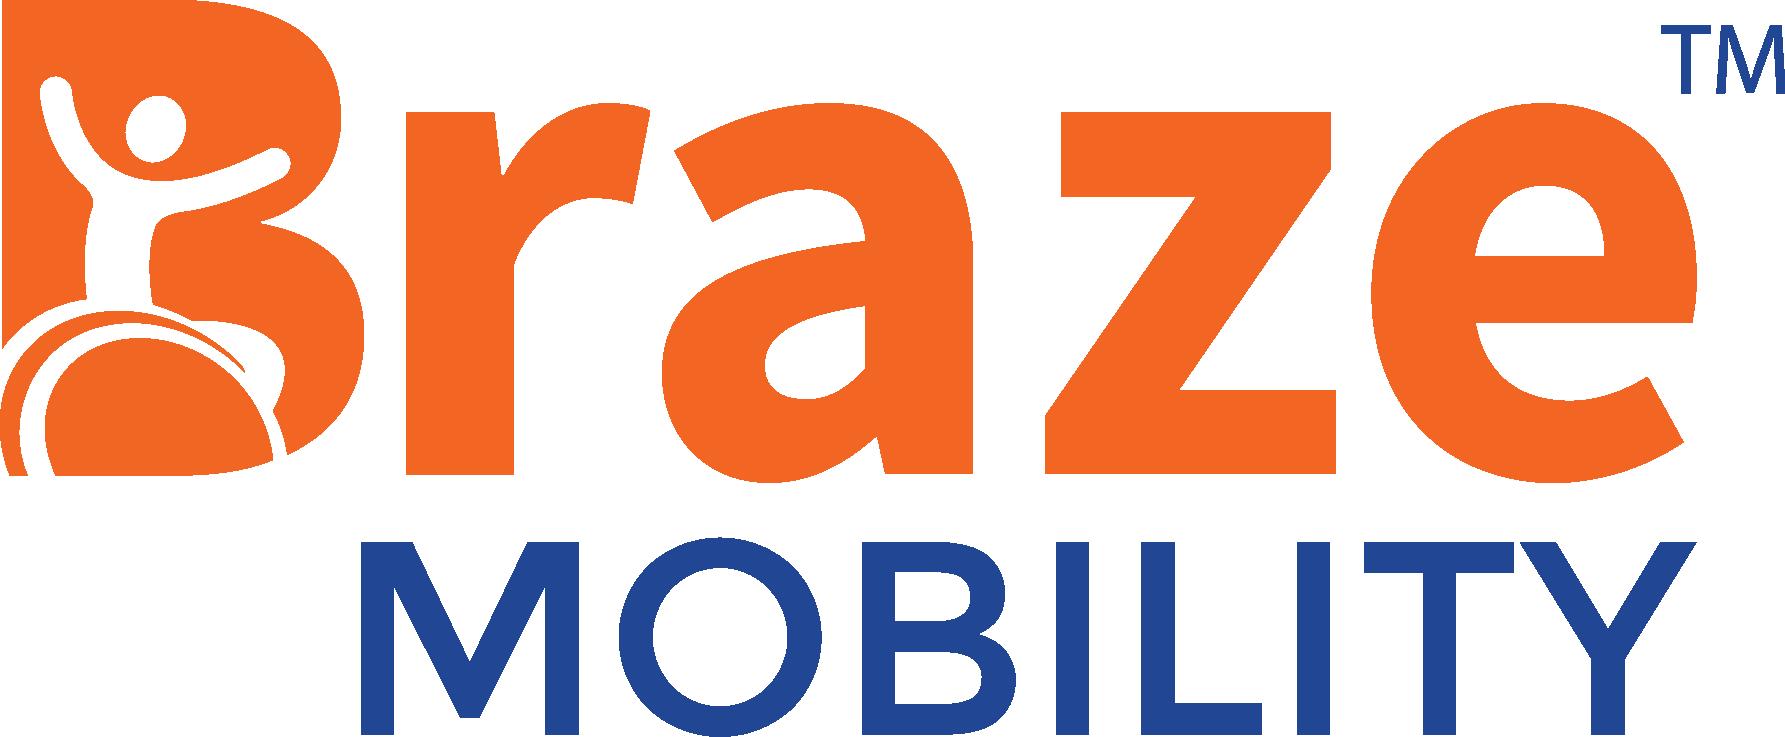 Braze Mobility.Logo.v5.2.png